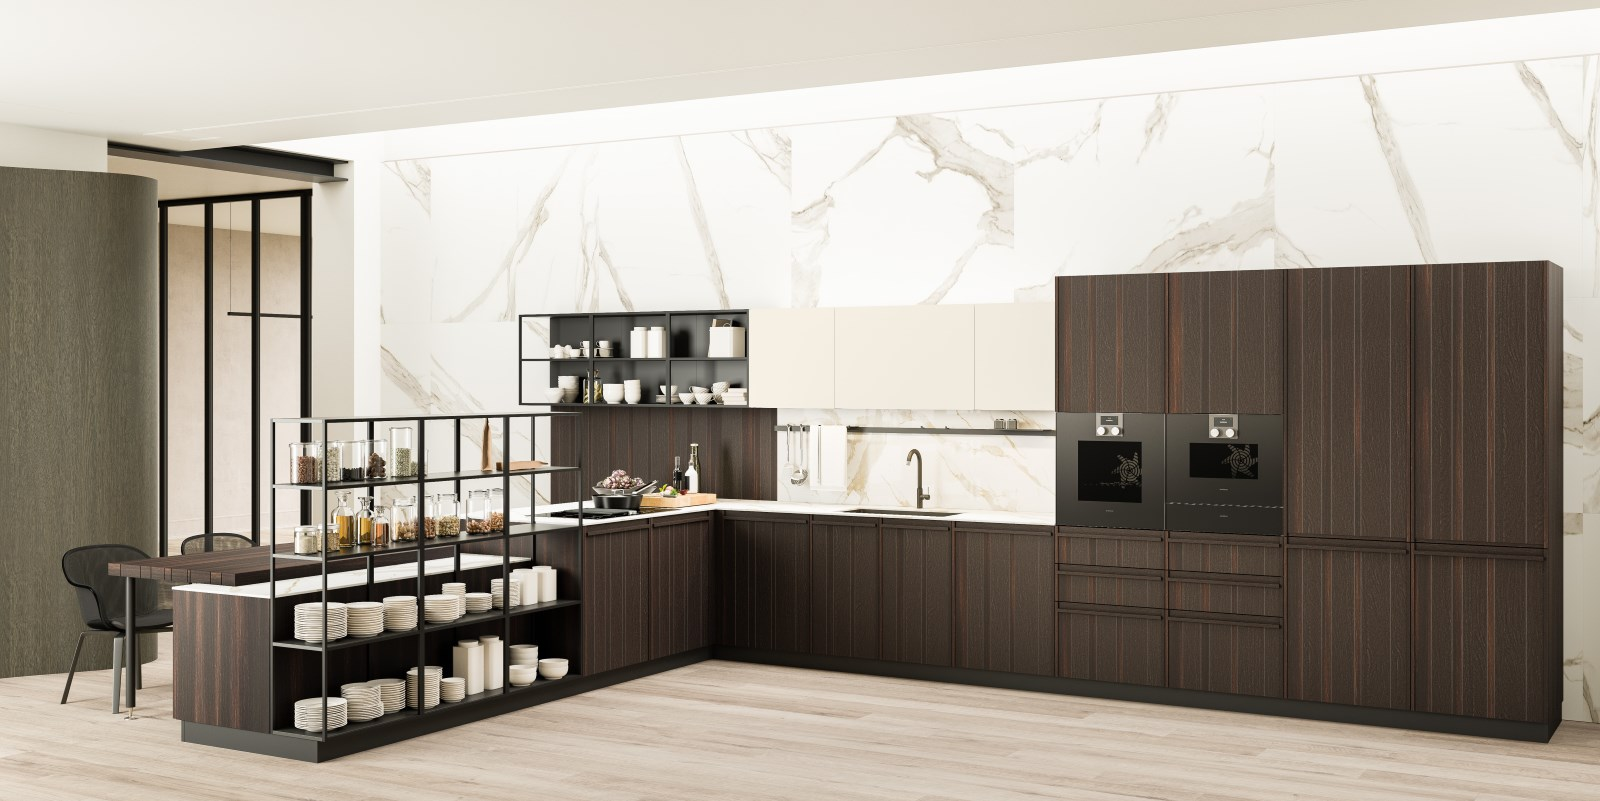 Cucine composit cucine moderne di design arredamento cucine componibili - Cucine di design ...